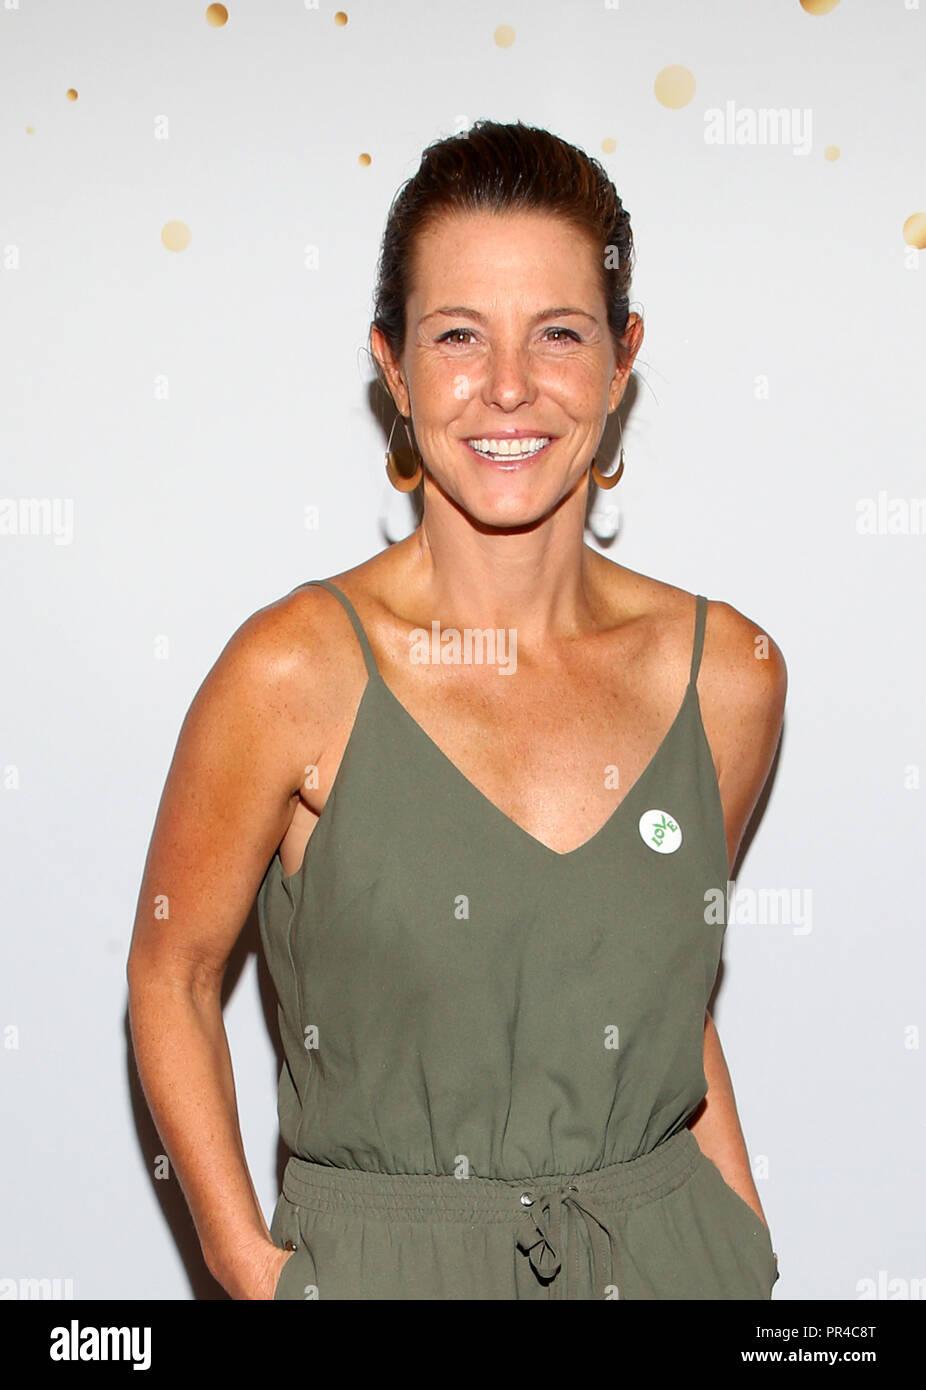 Stephanie Leather Ruhle